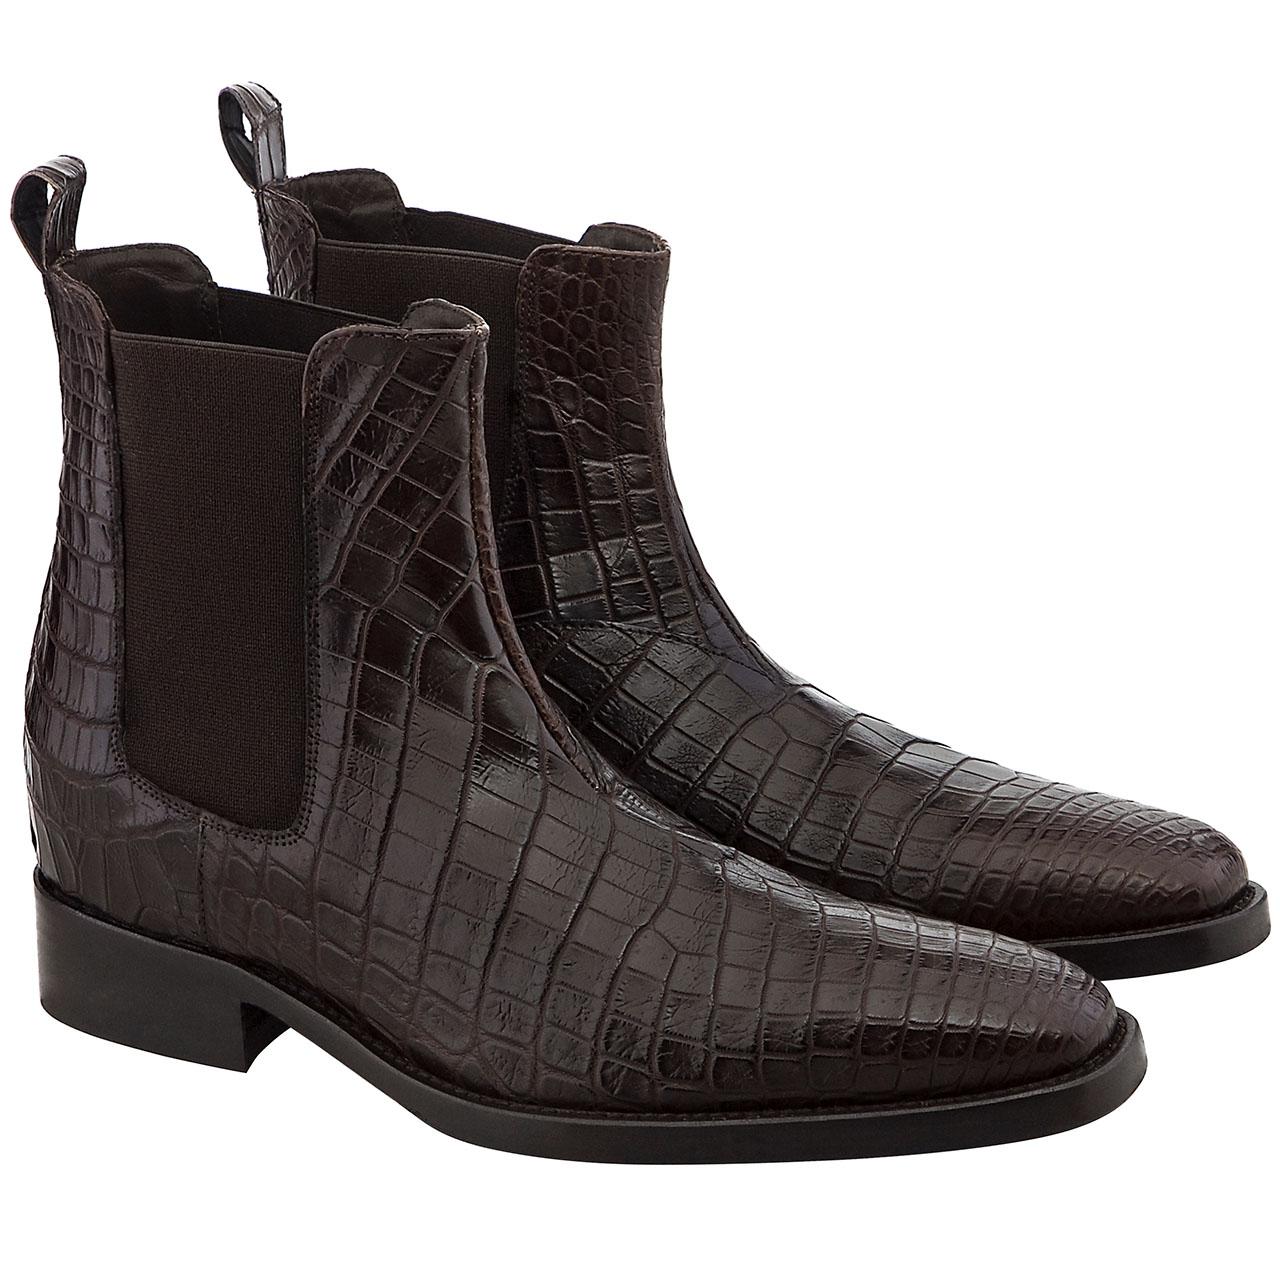 Cape Town - Elevator Shoes Guidomaggi, Crocodile Boots